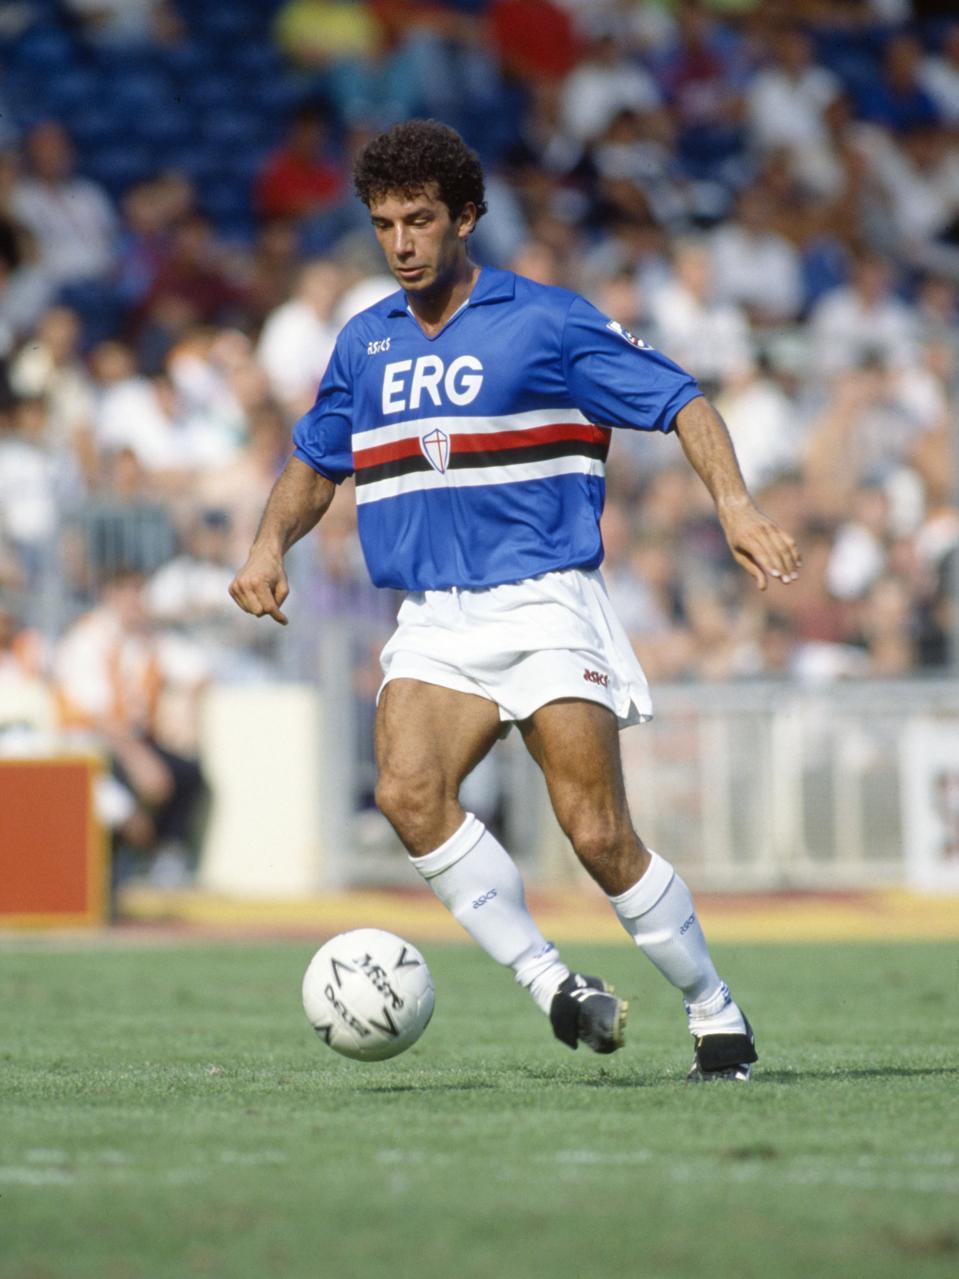 Sport. Football. pic: 11th August 1990. The Makita Tournament at Wembley. Sampdoria 1 v Arsenal 0. Gianluca Vialli, Sampdoria 1984-1992. Gianluca Vialli won 59 Italy international caps between 1985-1993.